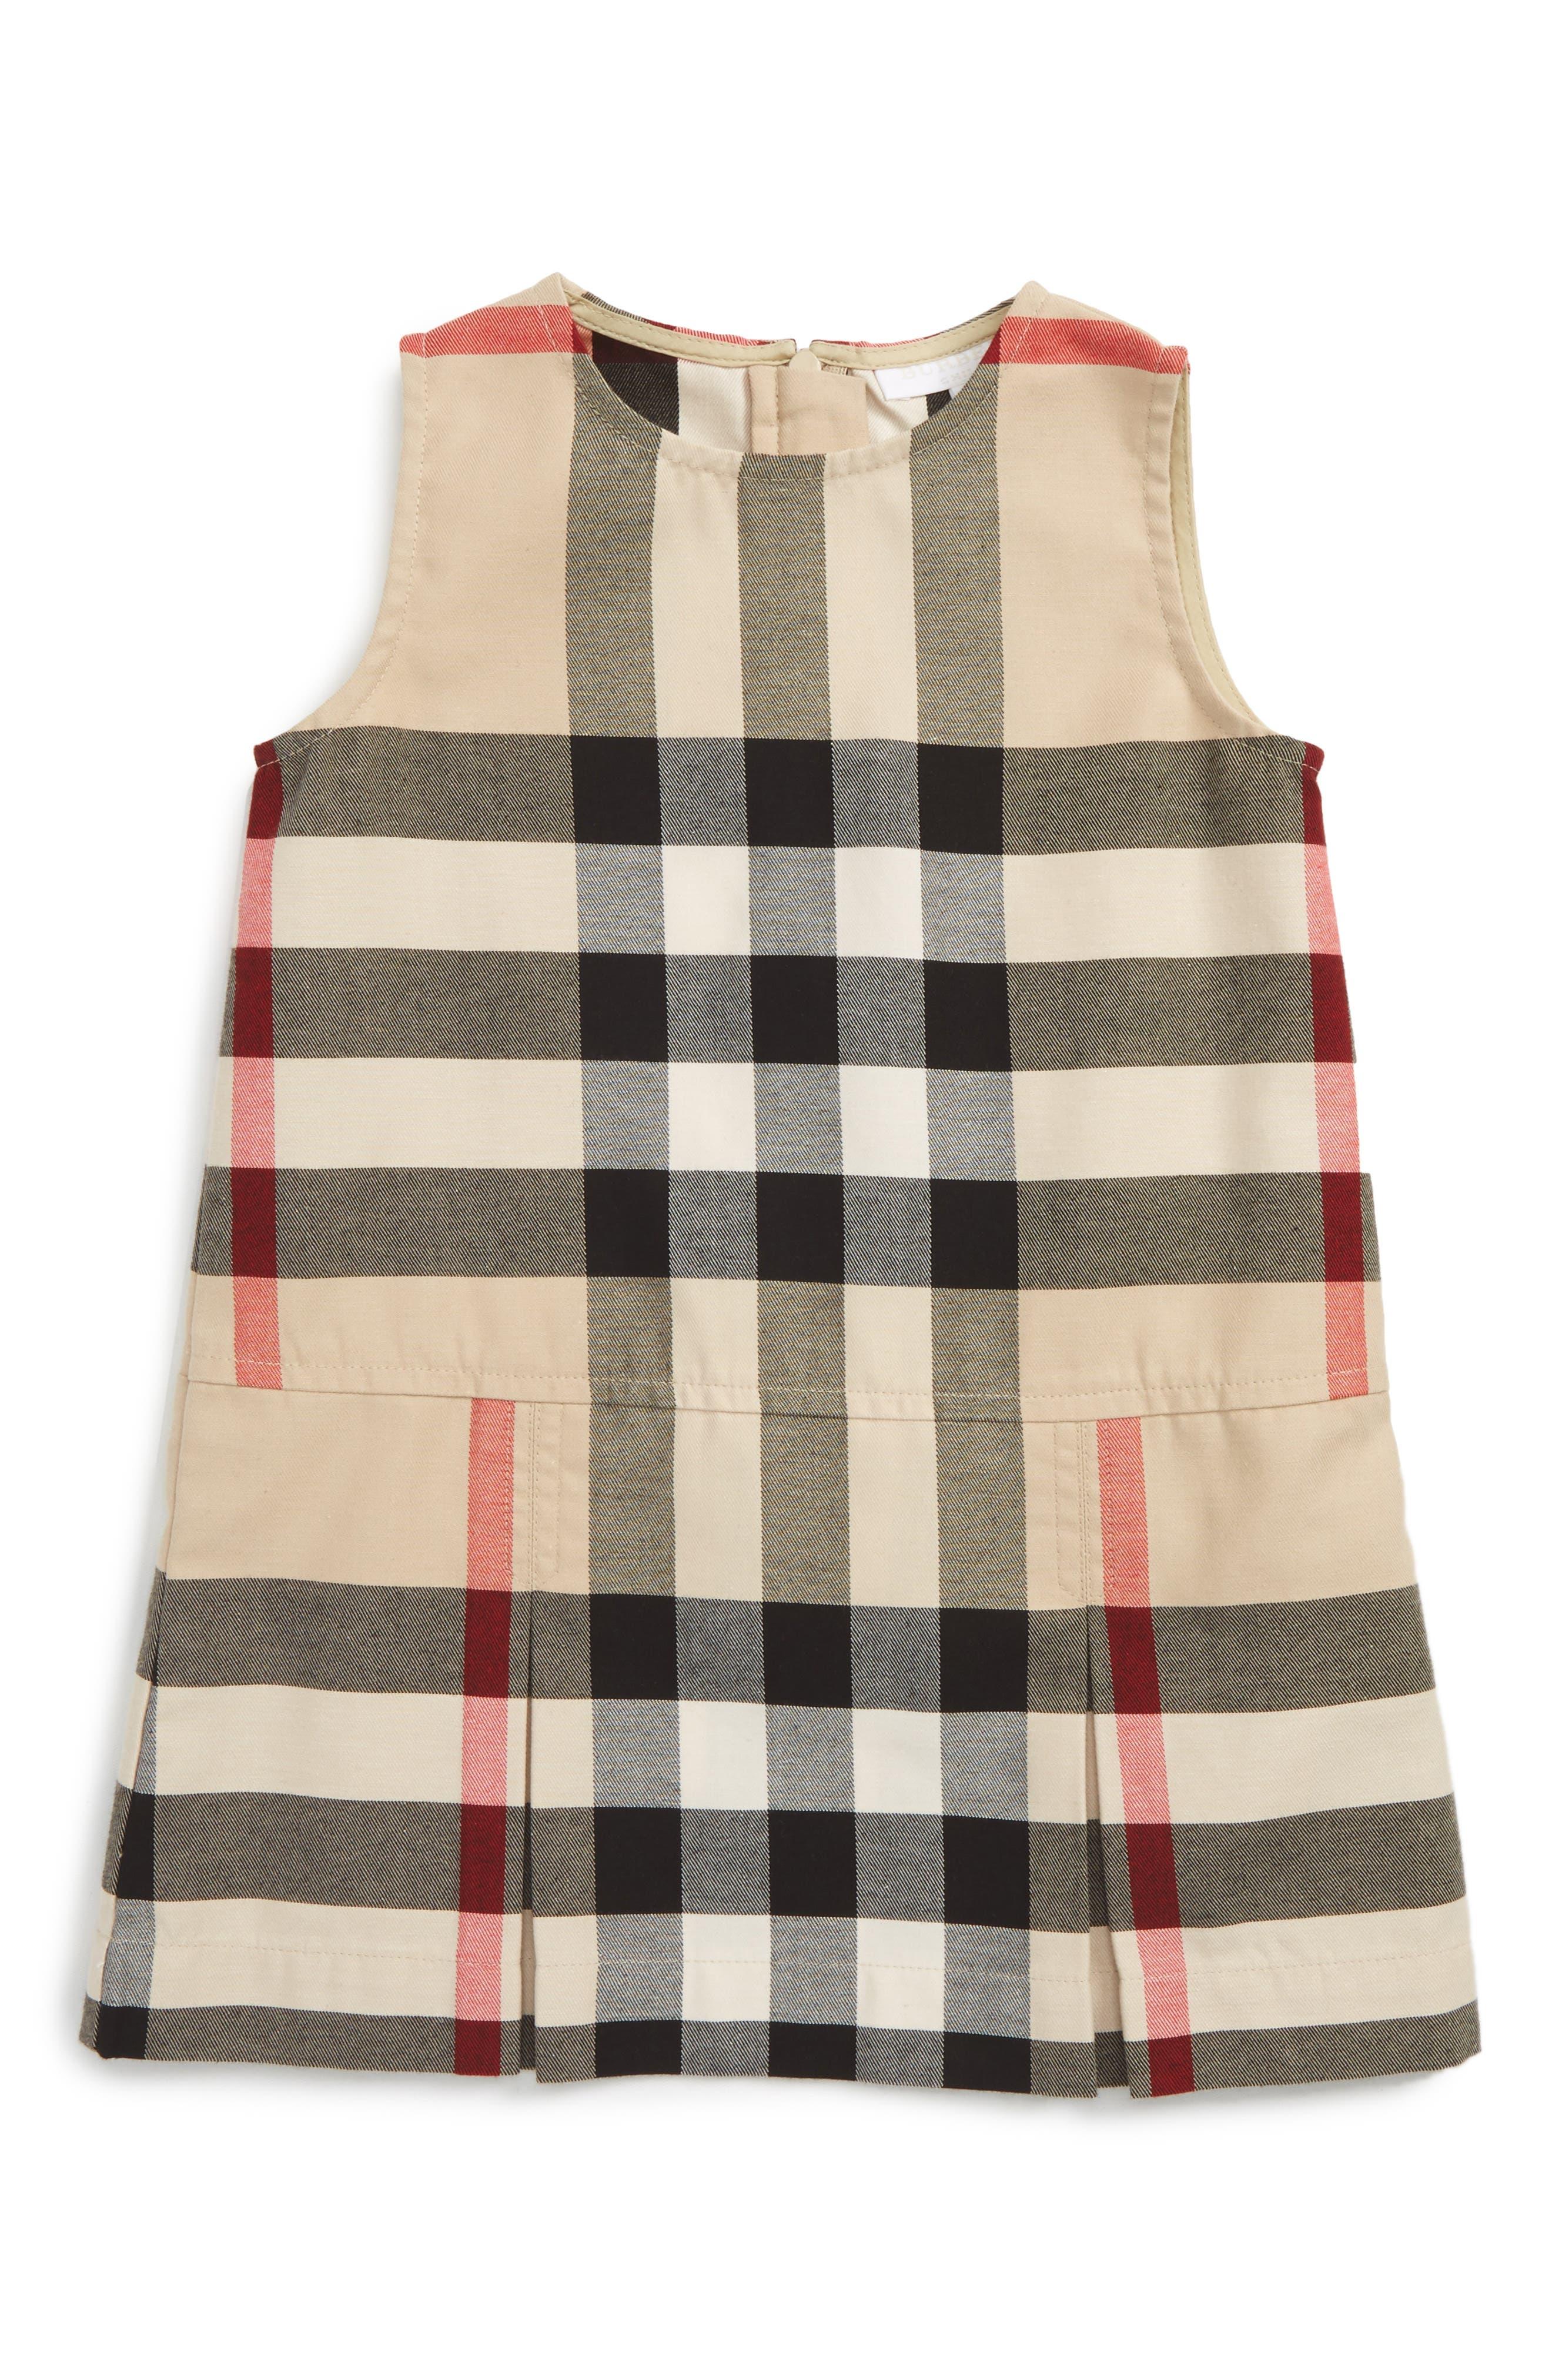 Dawny Check Print Sleeveless Dress,                             Main thumbnail 1, color,                             250